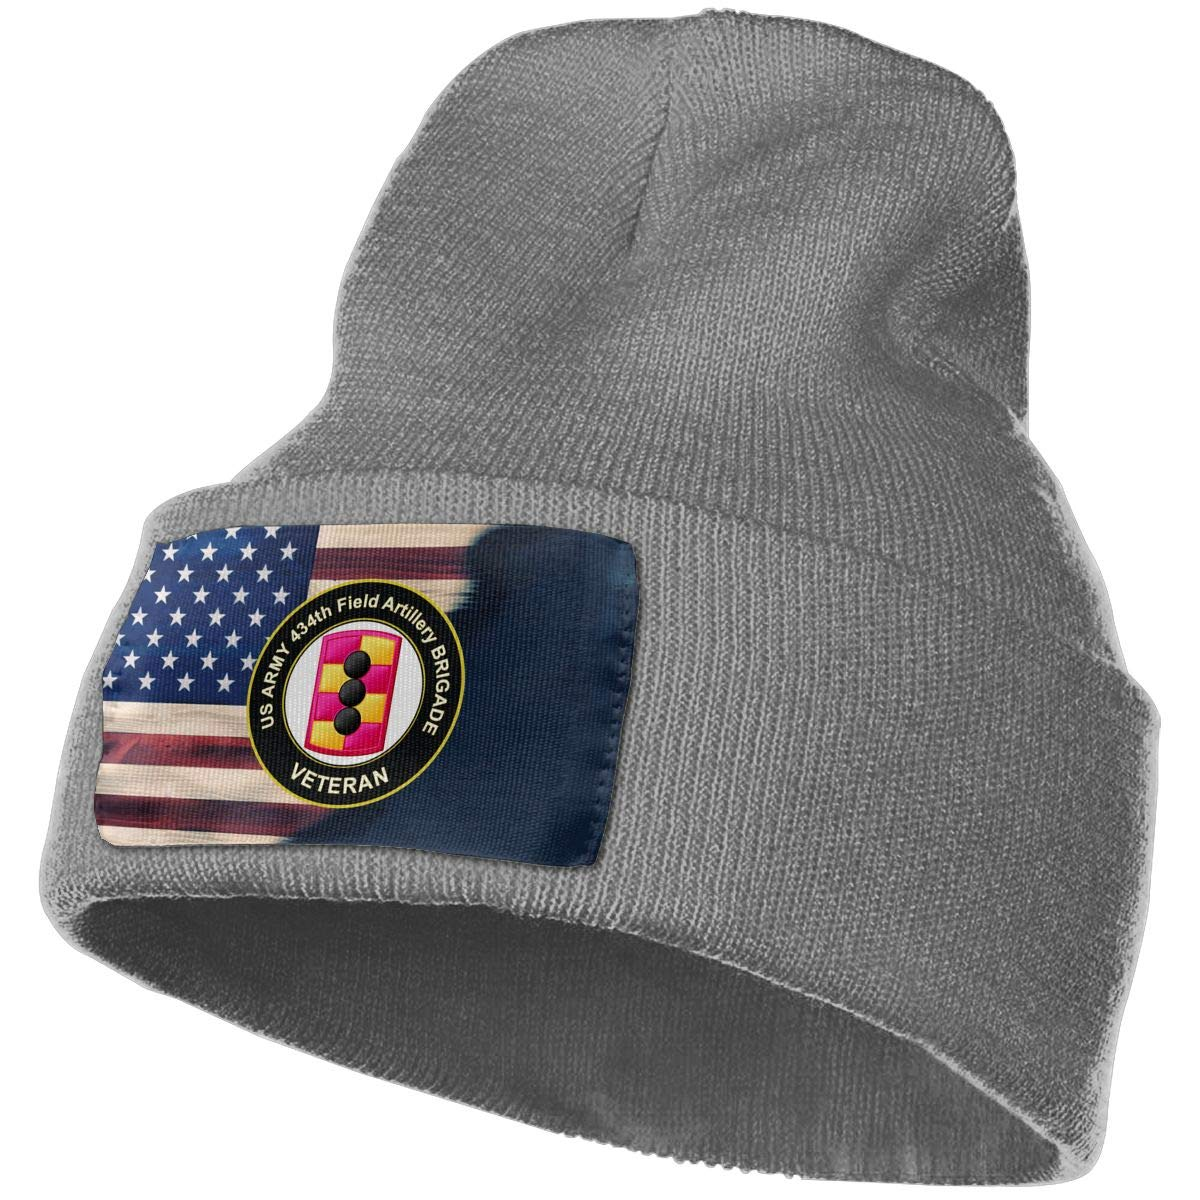 FORDSAN CP US Army 214th Field Artillery Brigade Veteran Mens Beanie Cap Skull Cap Winter Warm Knitting Hats